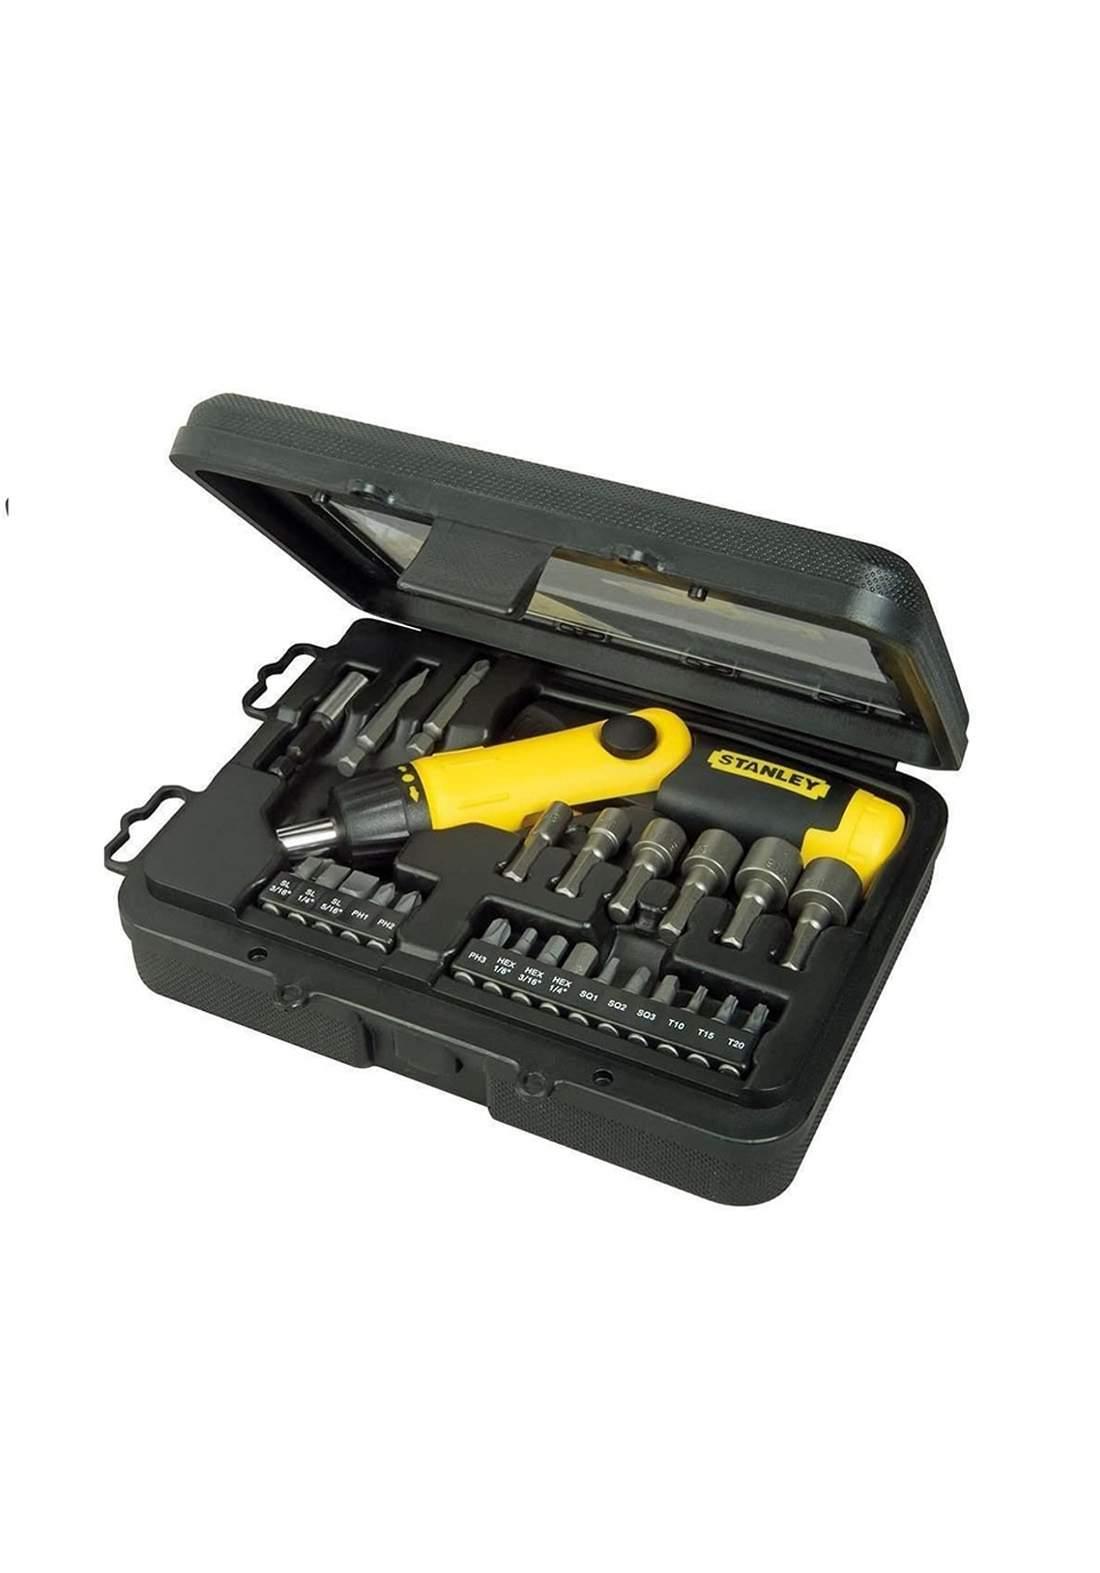 Stanley 0-63-022 Pistol Grip Screwdriver Bag Set 22 Piece سيت رؤوس مفكات مع مقبض